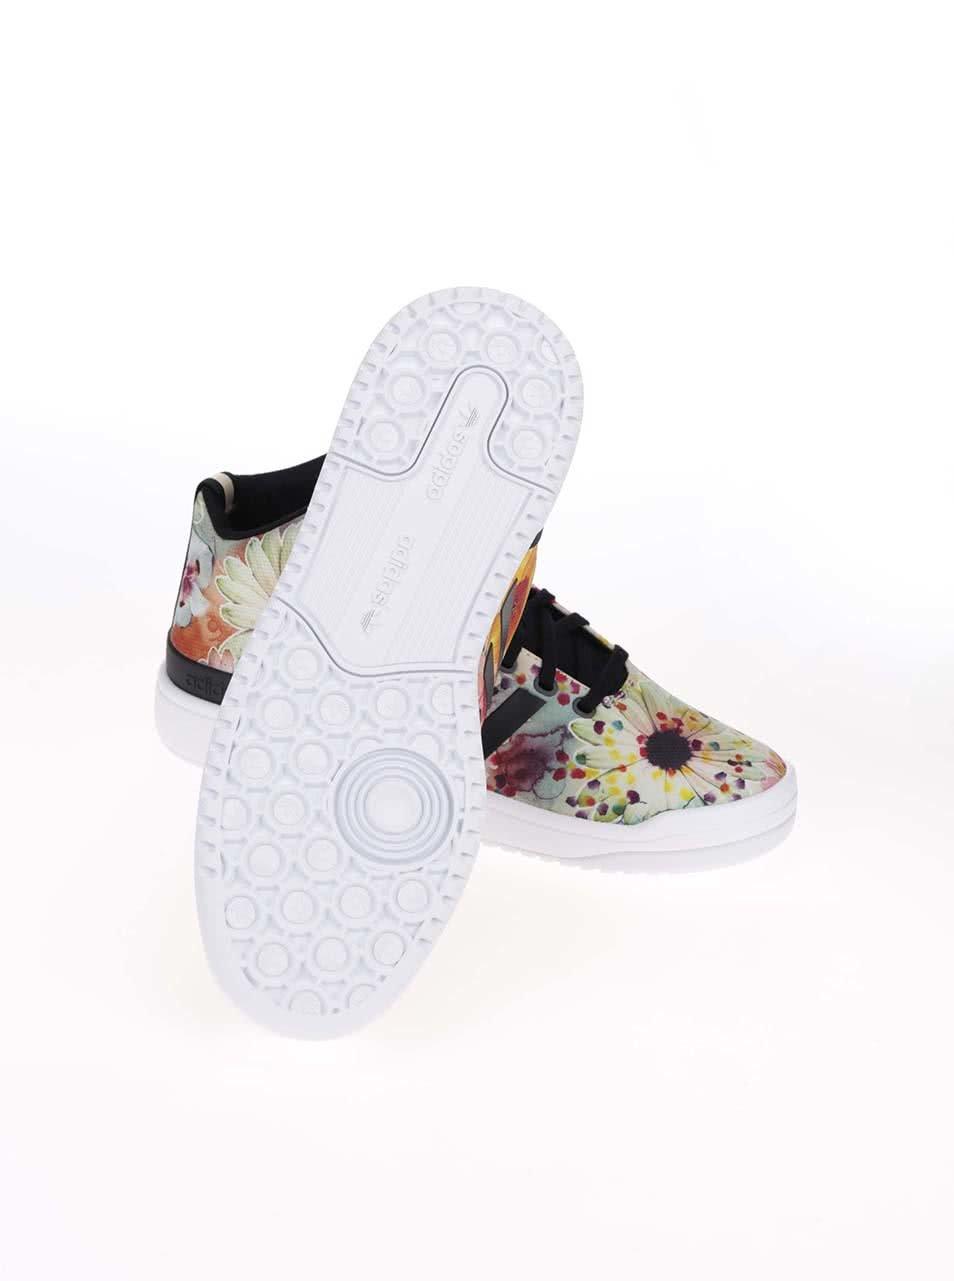 Barevné dámské kotníkové tenisky s potiskem adidas Originals Veritas W ... 7cebee6fec